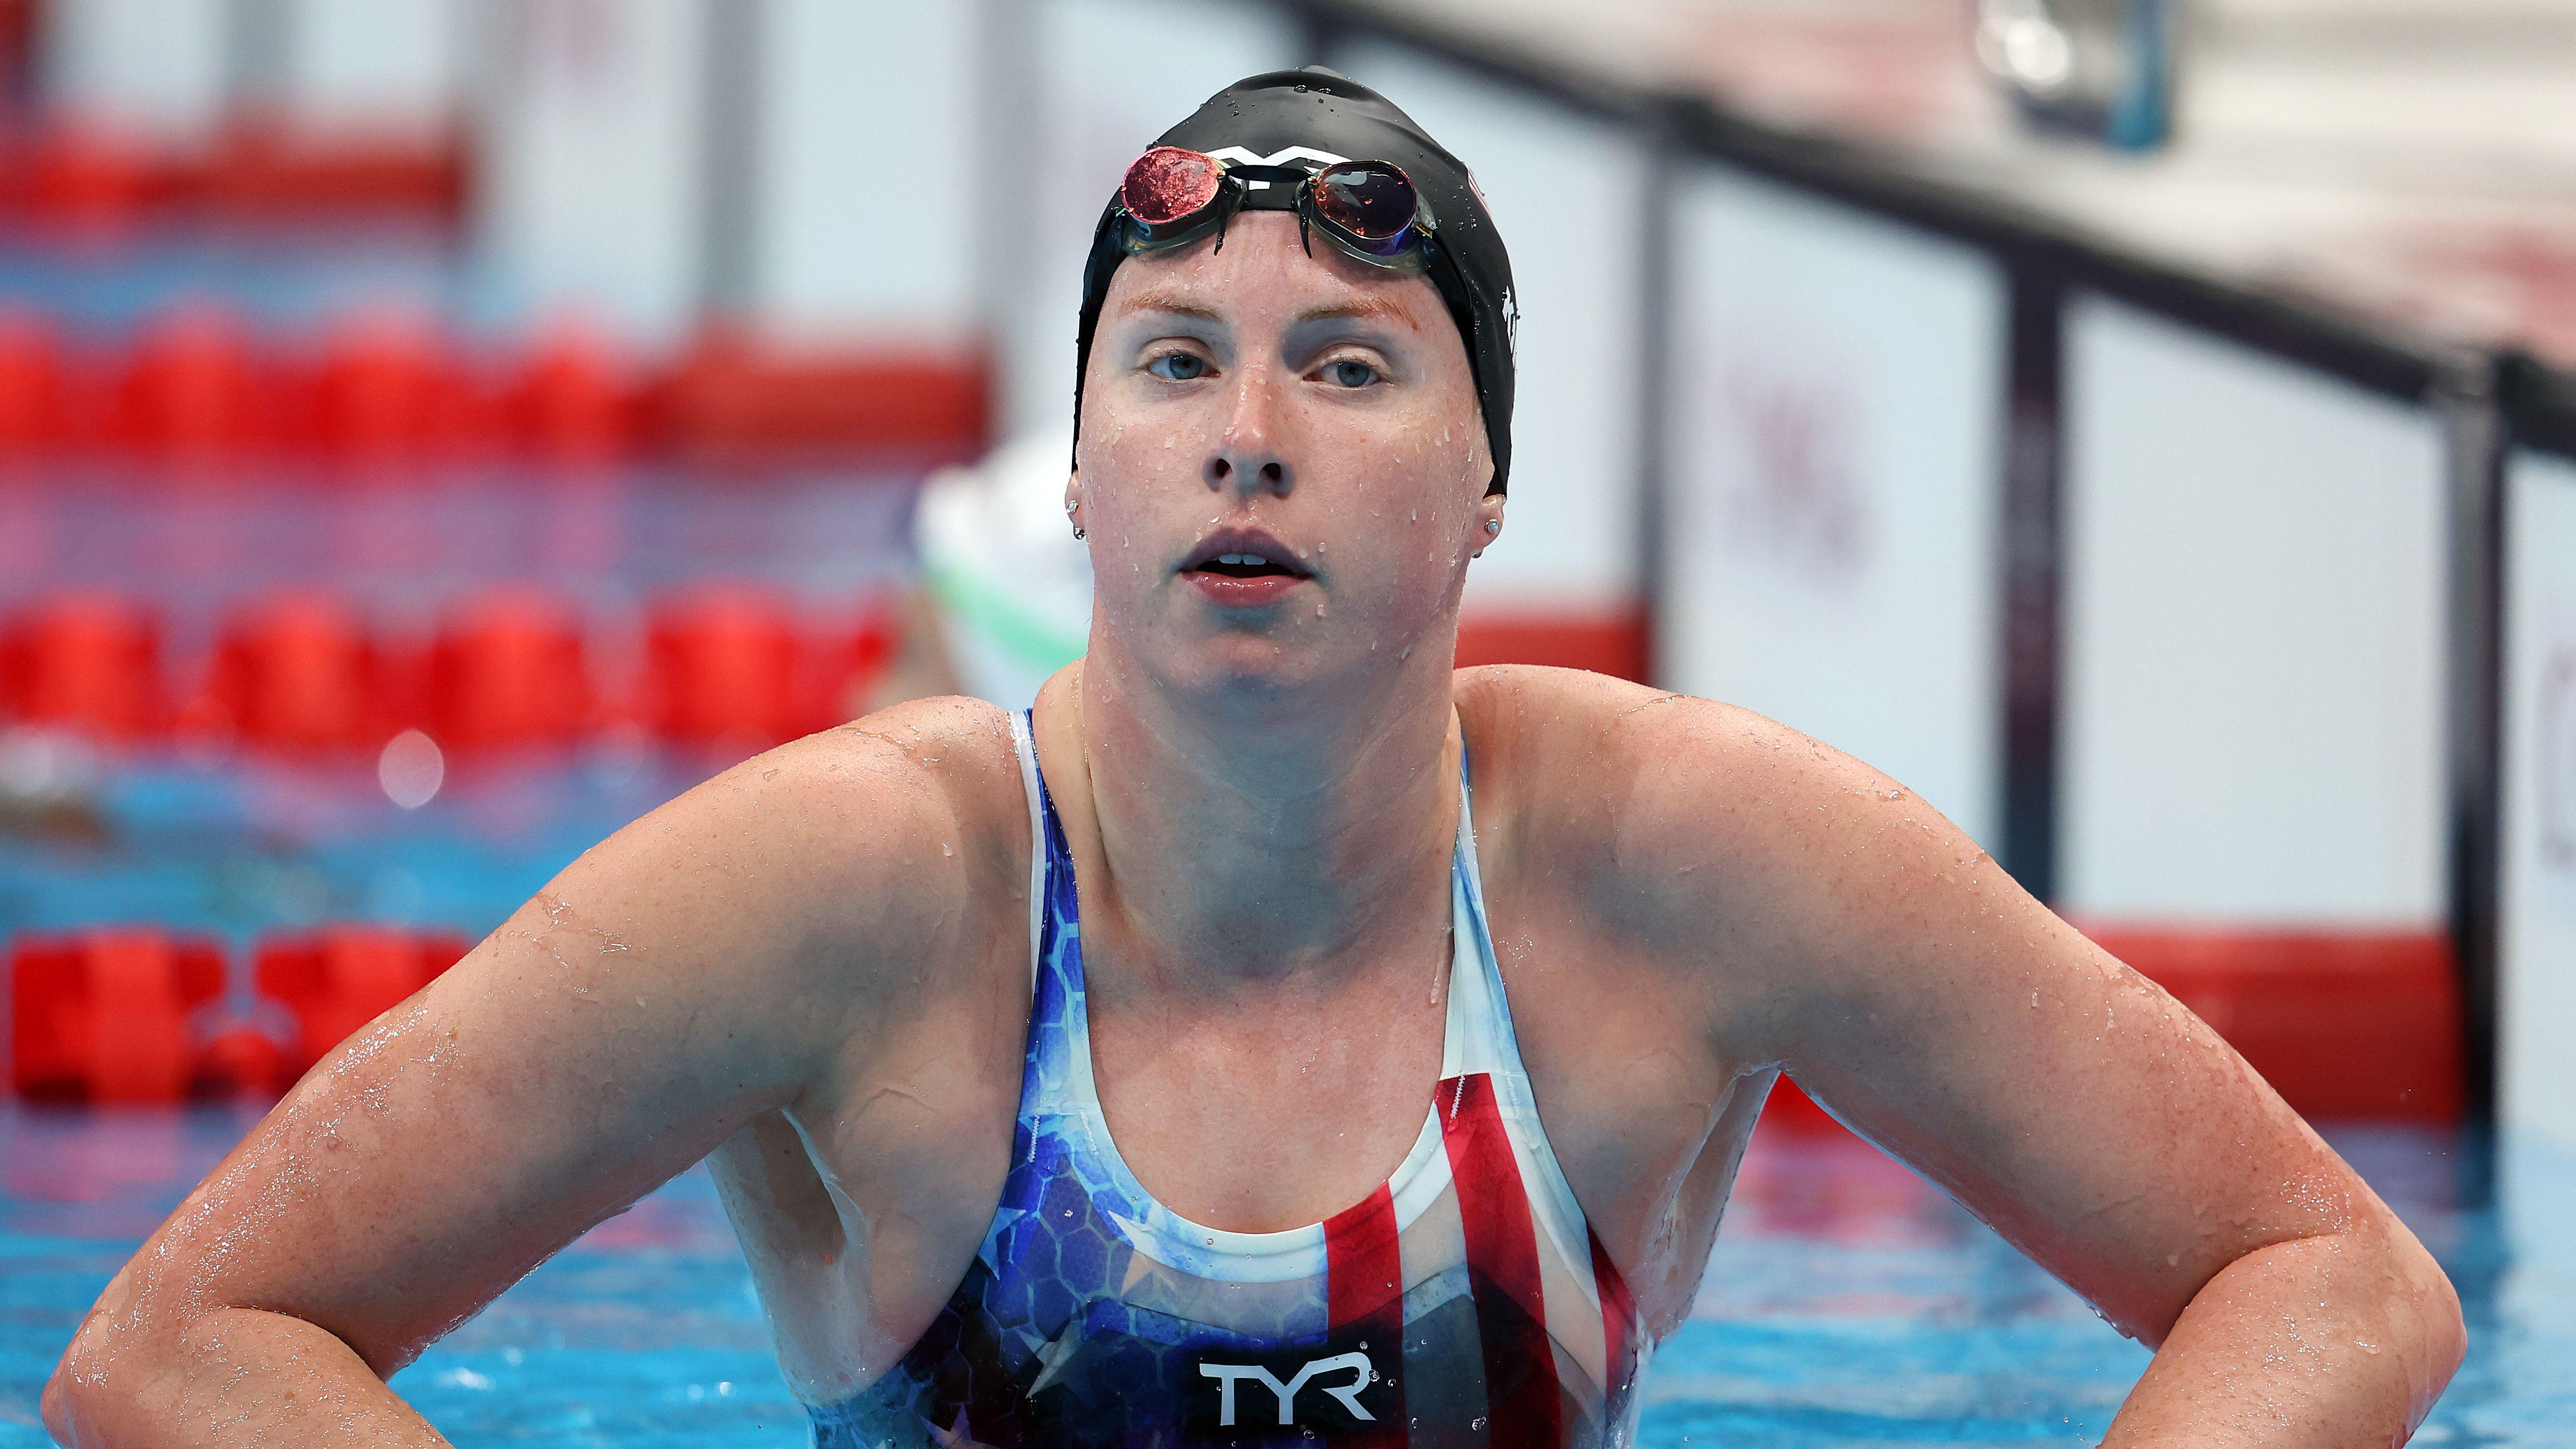 Swimming villain's startling response to silver